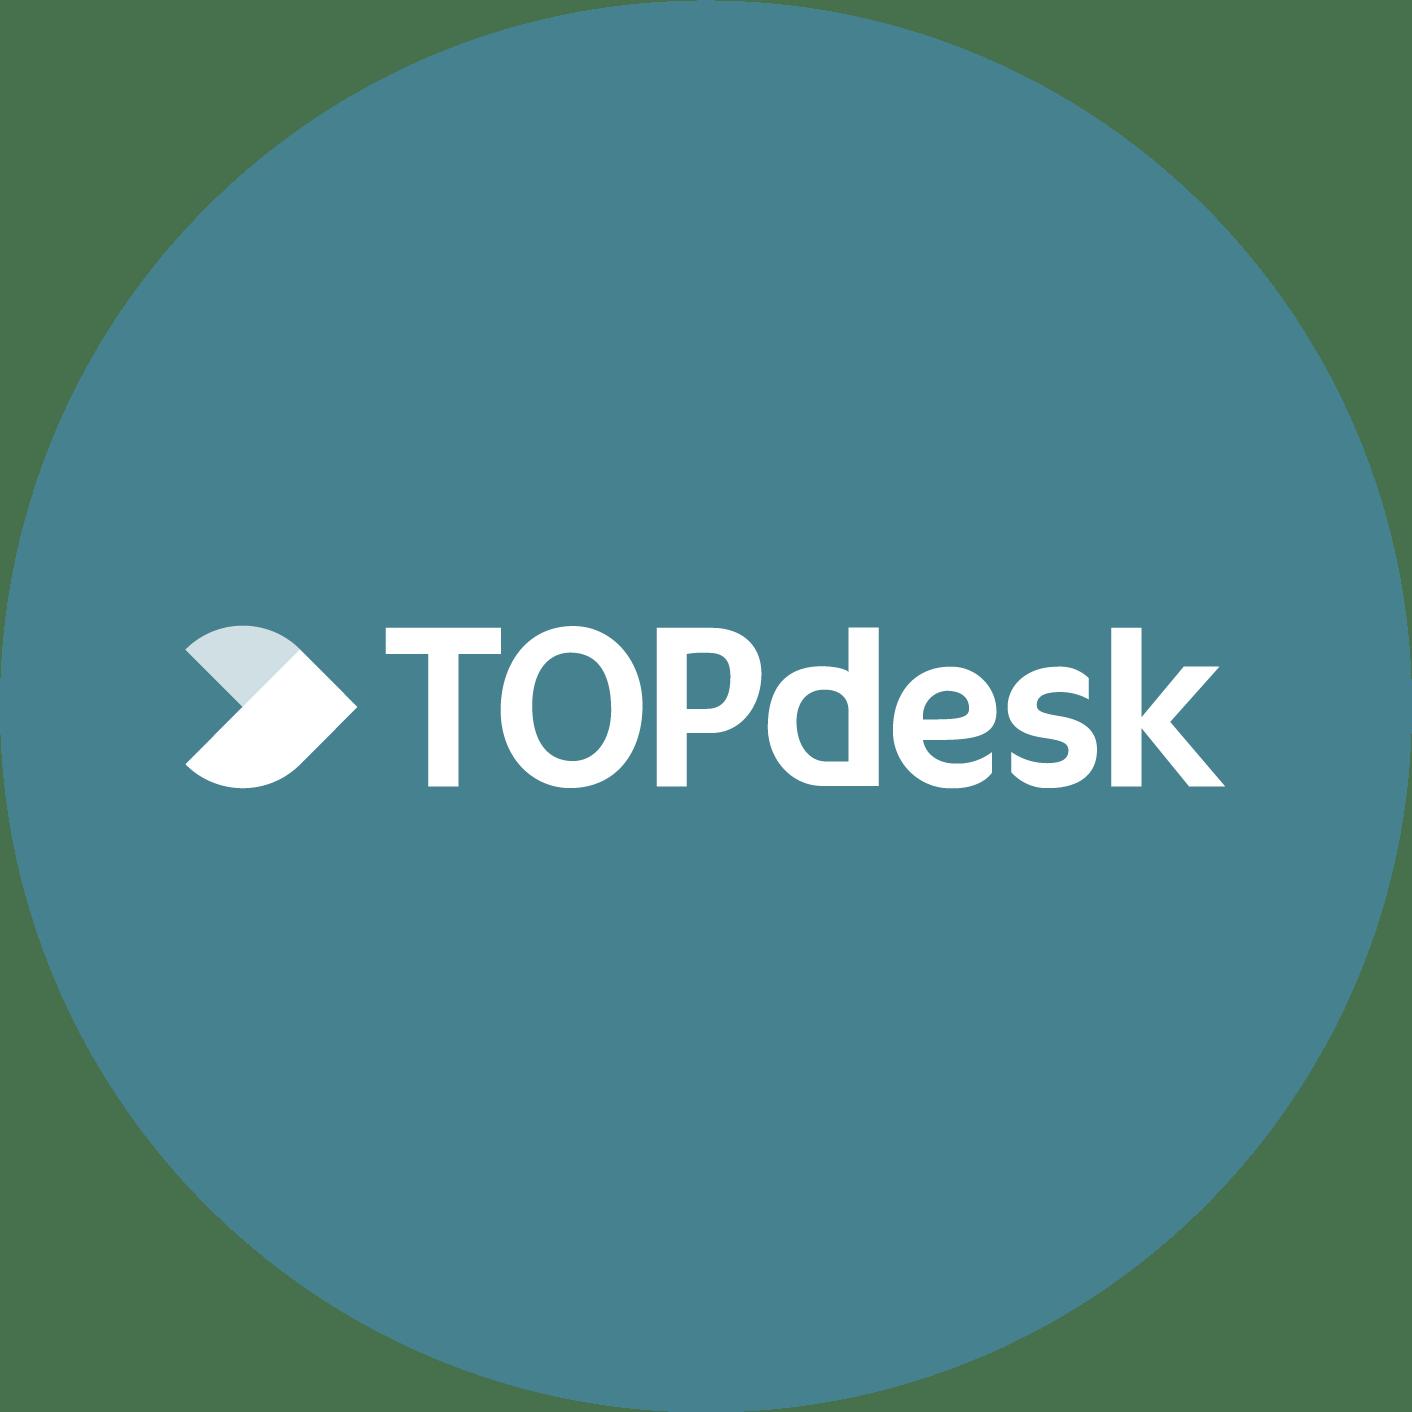 topdesk_blob_blue